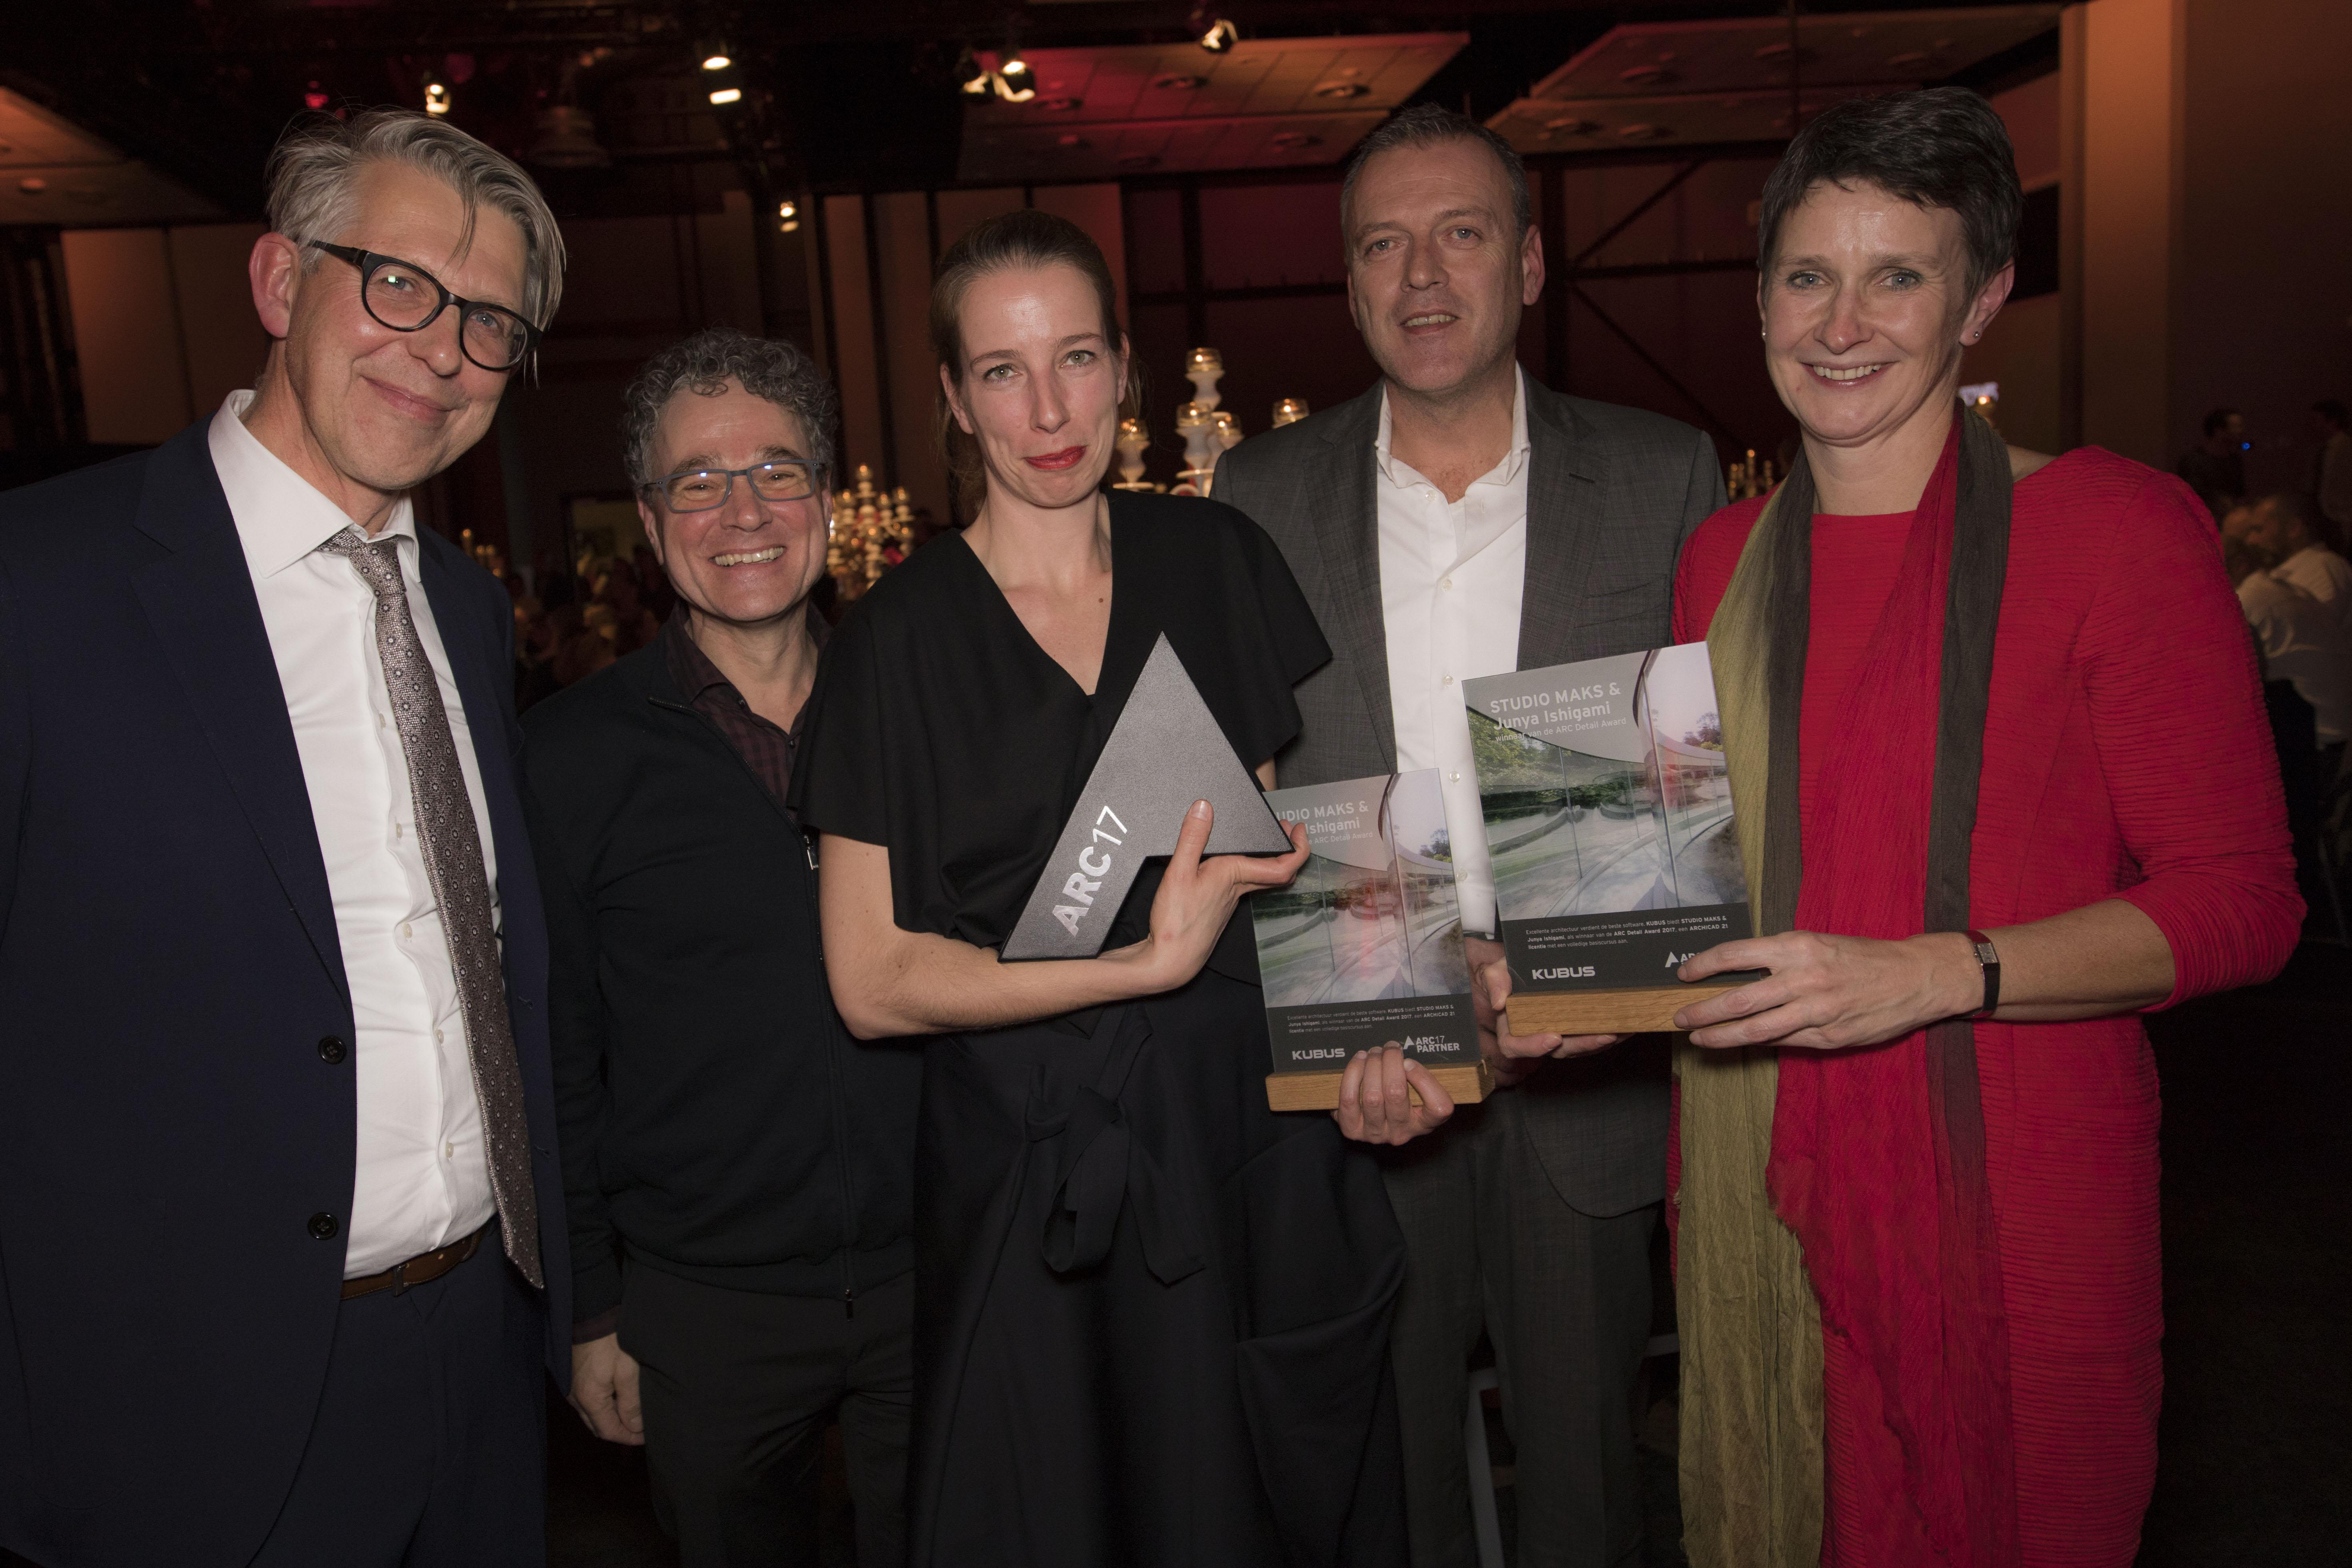 <p>STUDIO MAKS en JUNYA.ISHIGAMI+ASSOCIATES winnen de ARC17 Detail Award. Foto Elvins Fotografie</p>